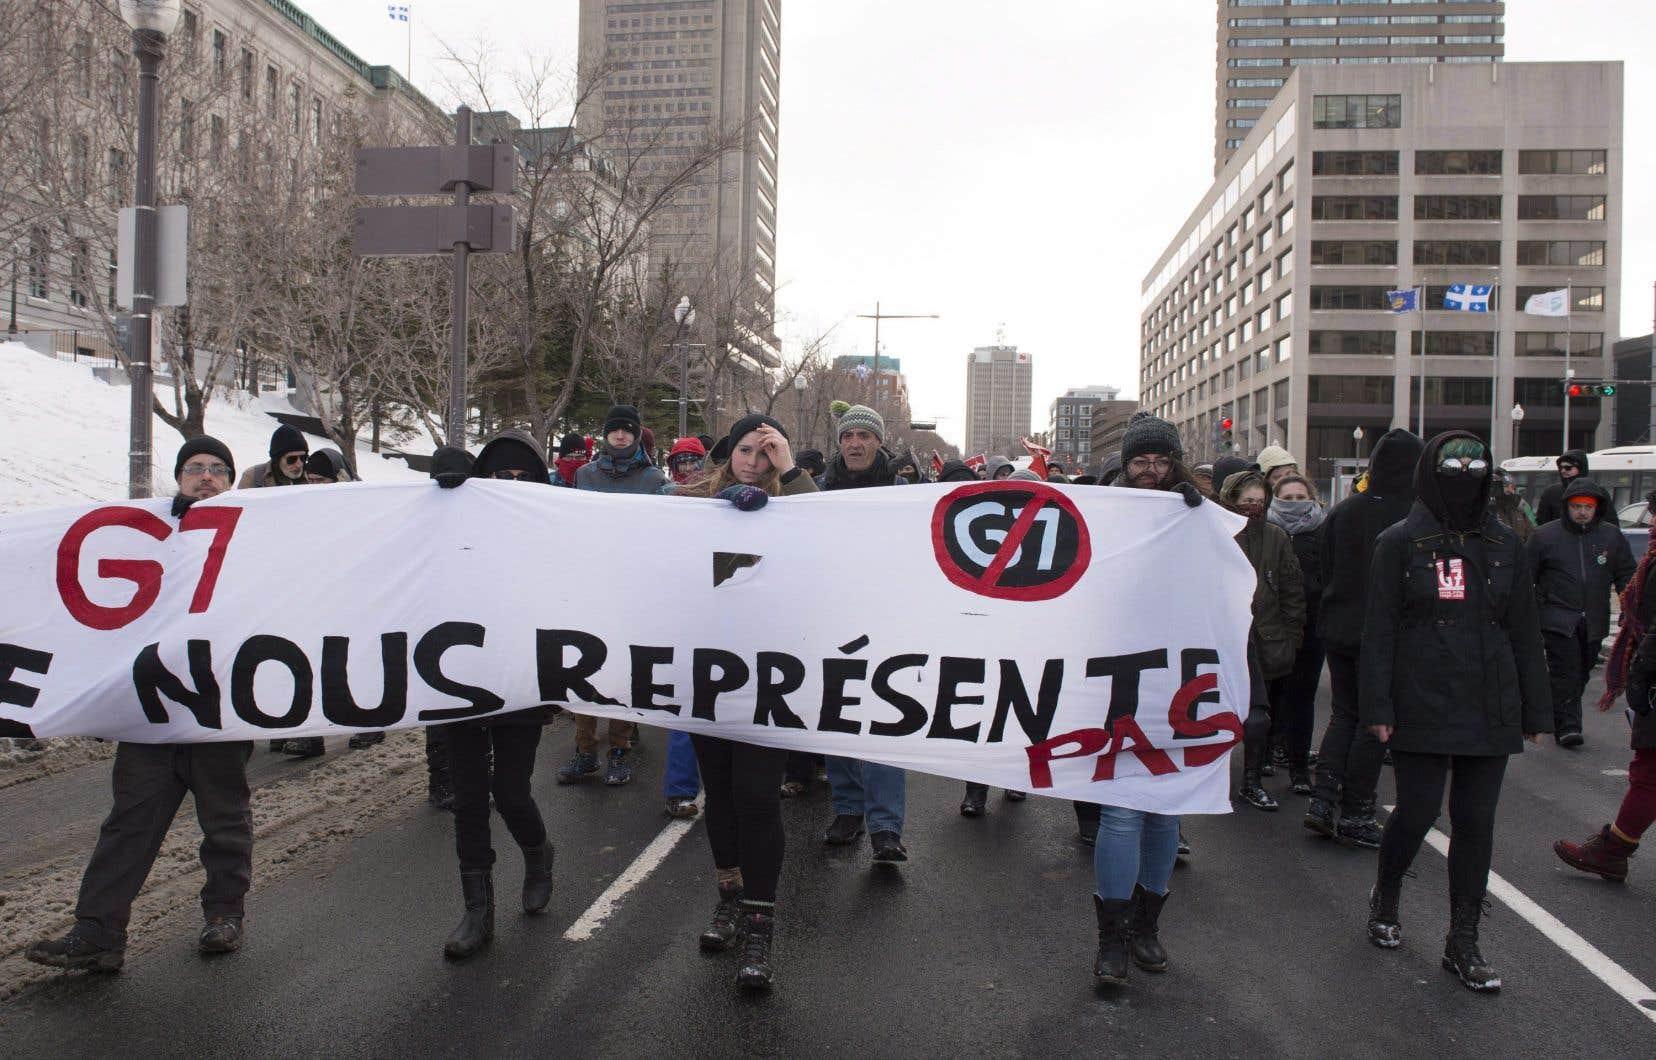 Sommet du g7 l opposition s organise et planifie des for Galerie du meuble quebec